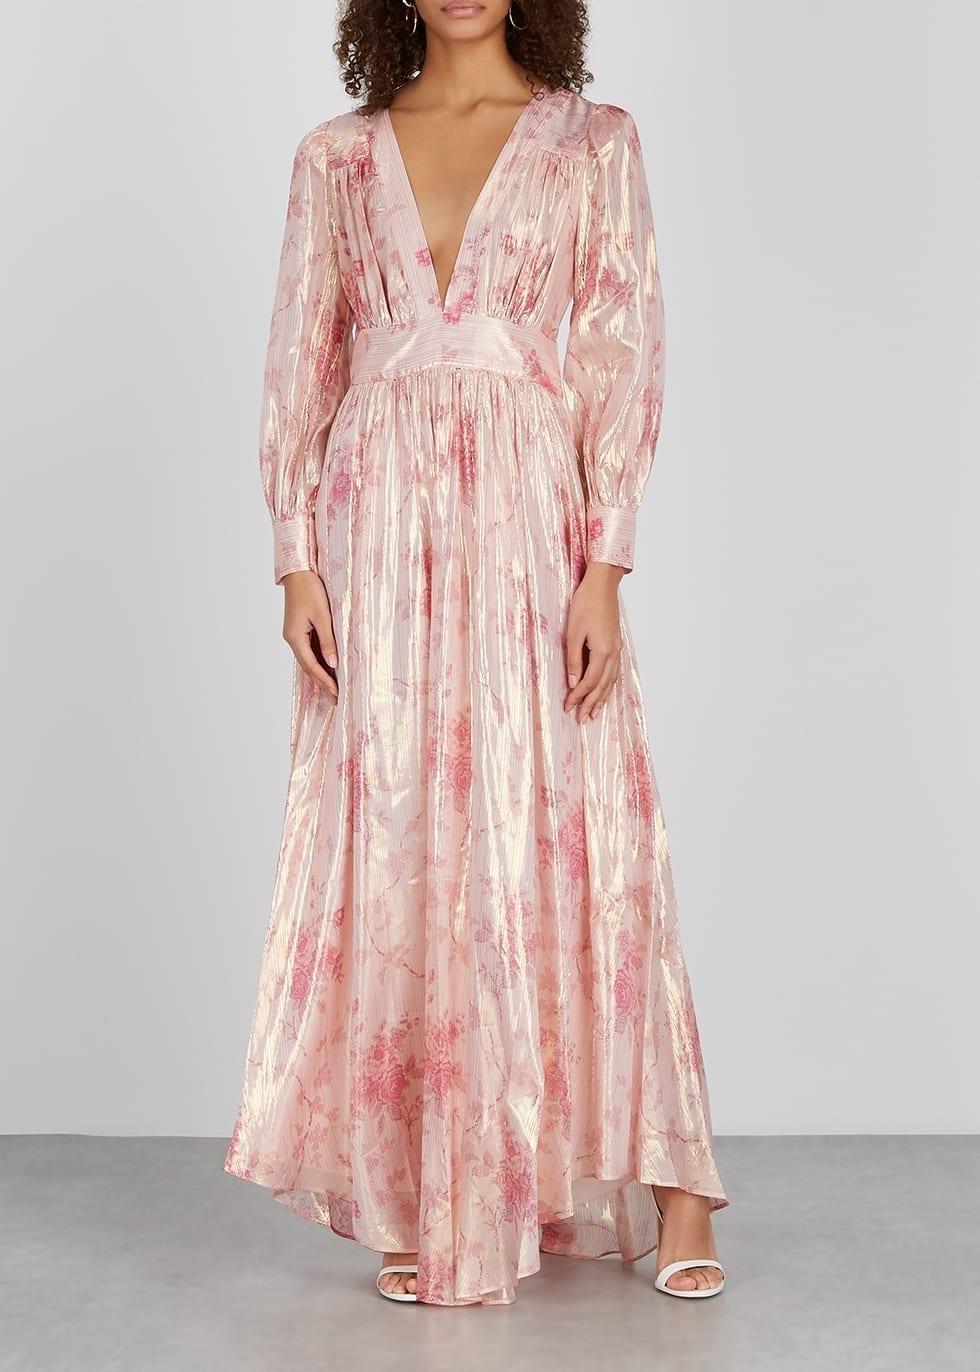 LOVESHACKFANCY Cyrene Floral-print Lamé-weave Maxi Dress